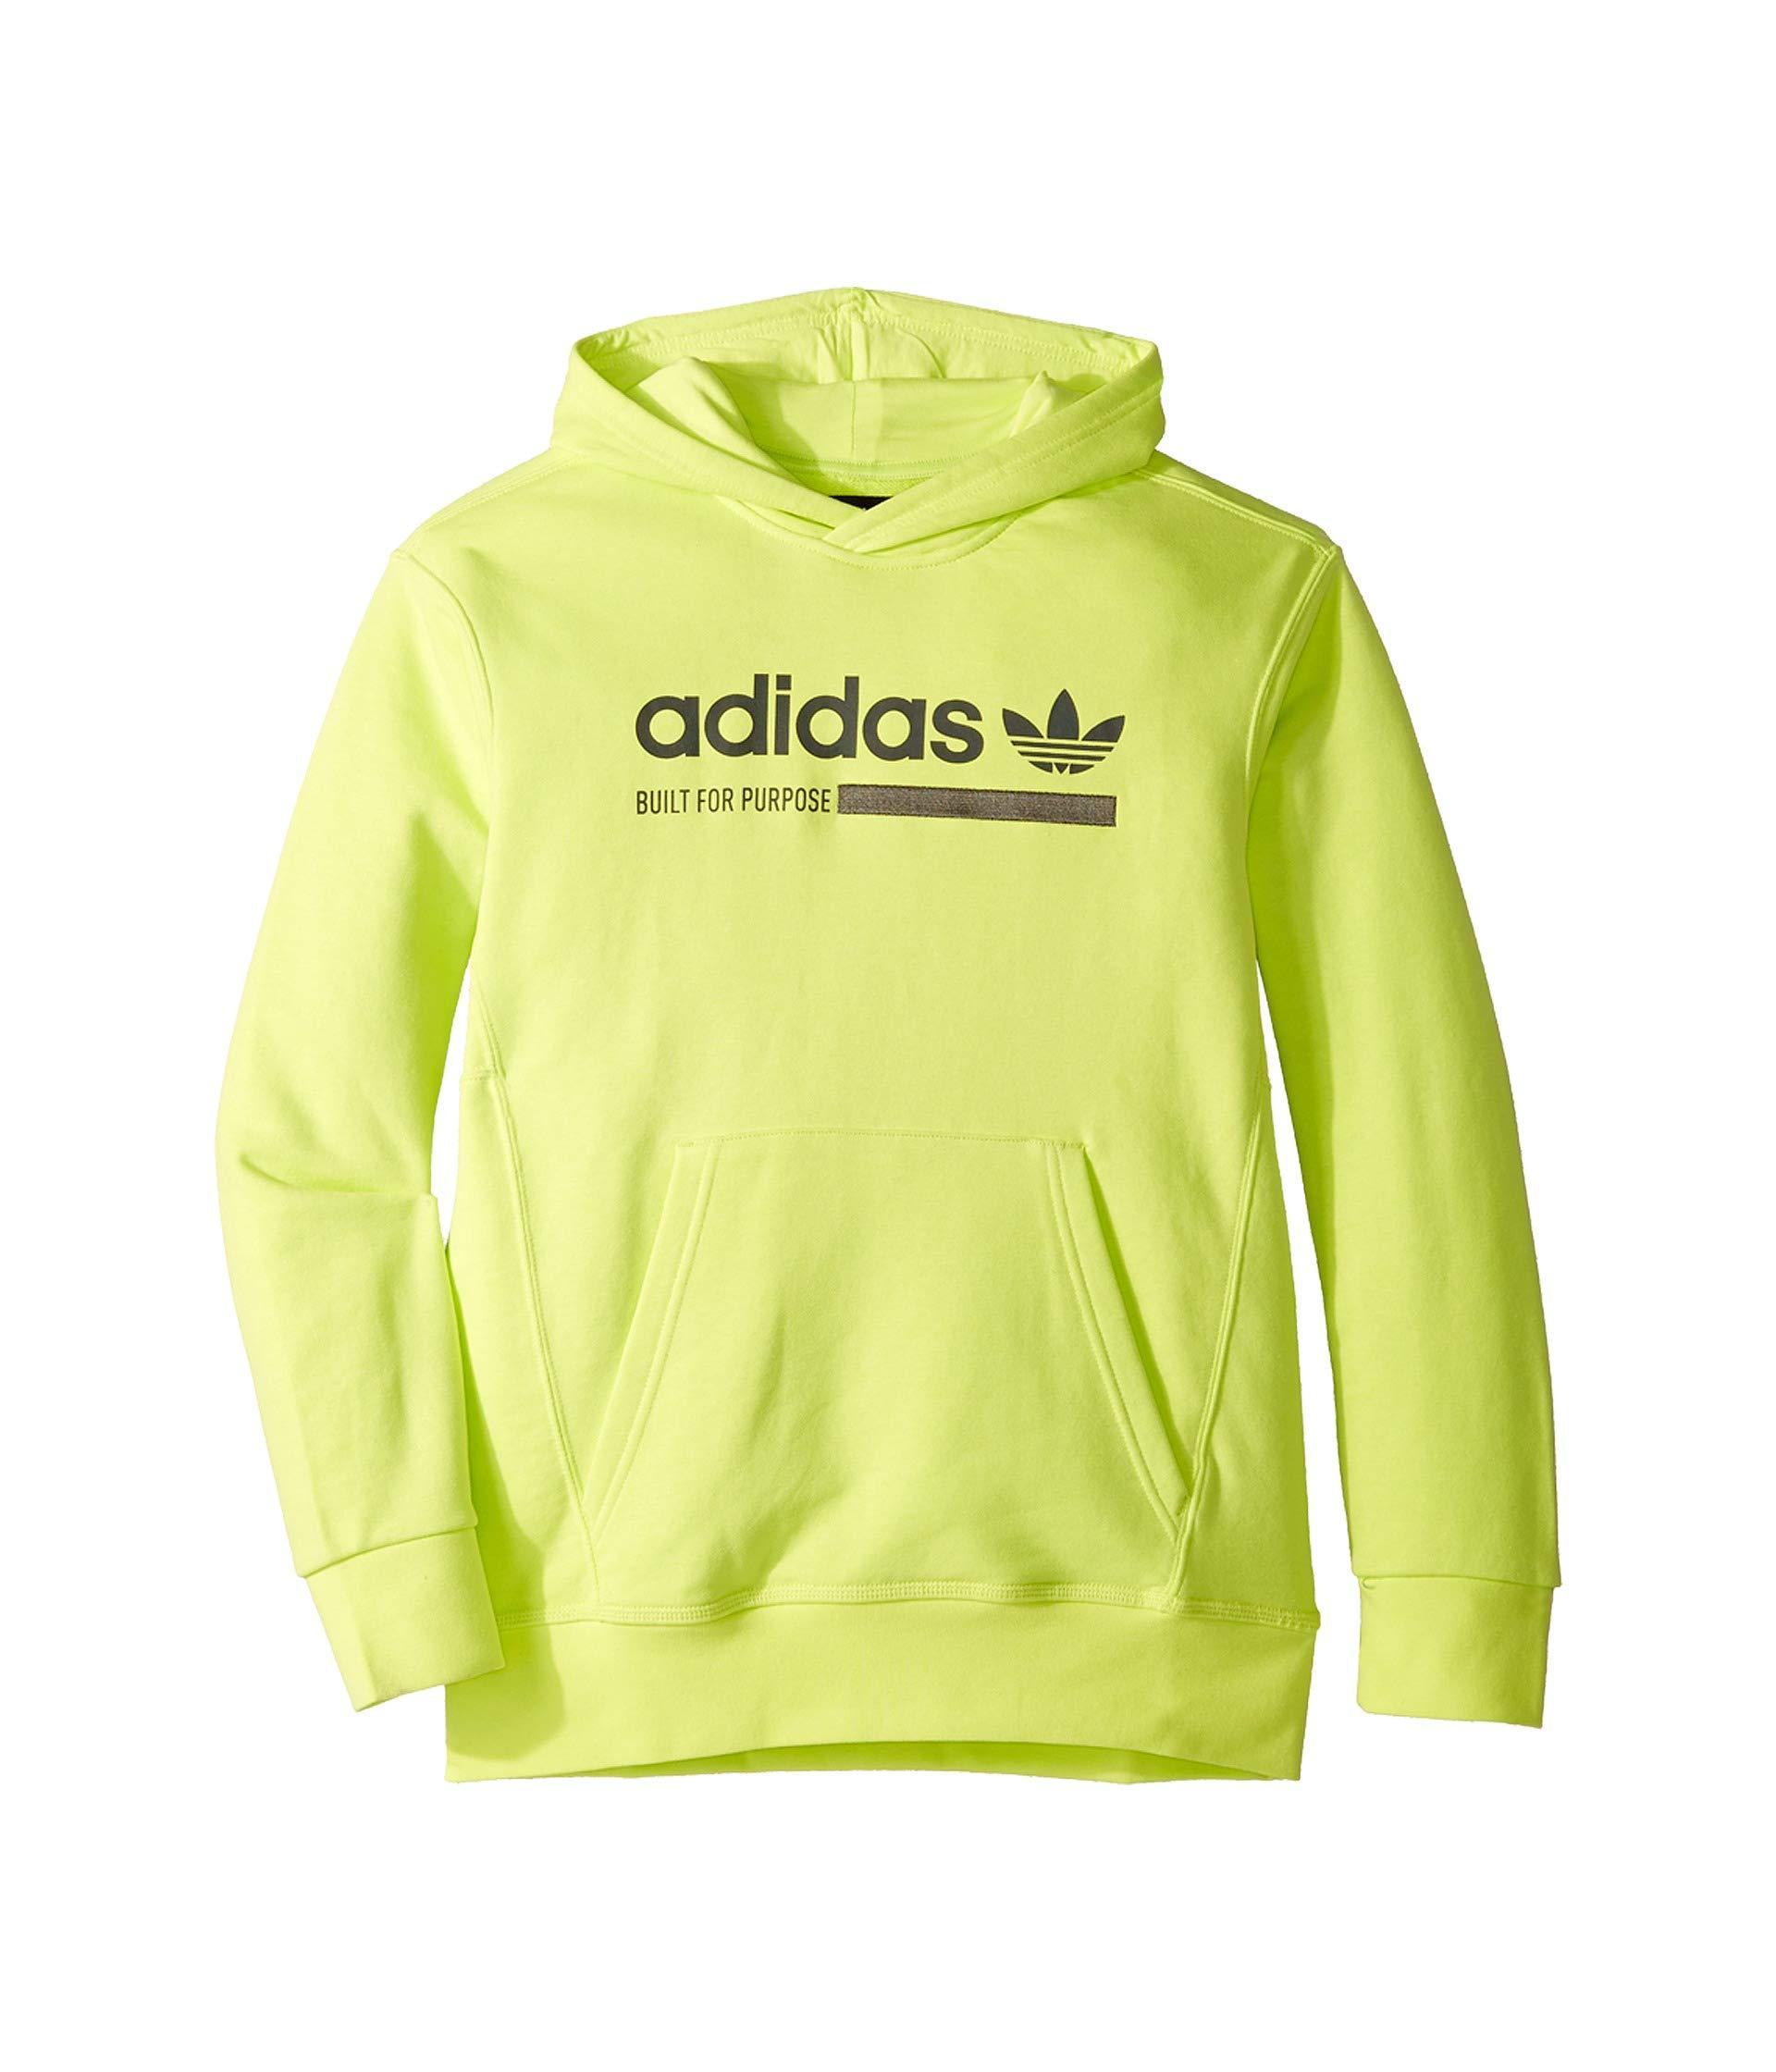 adidas Originals Kids Boy's Kaval Hoodie (Little Kids/Big Kids) Semi Frozen Yellow/Grey Six Medium